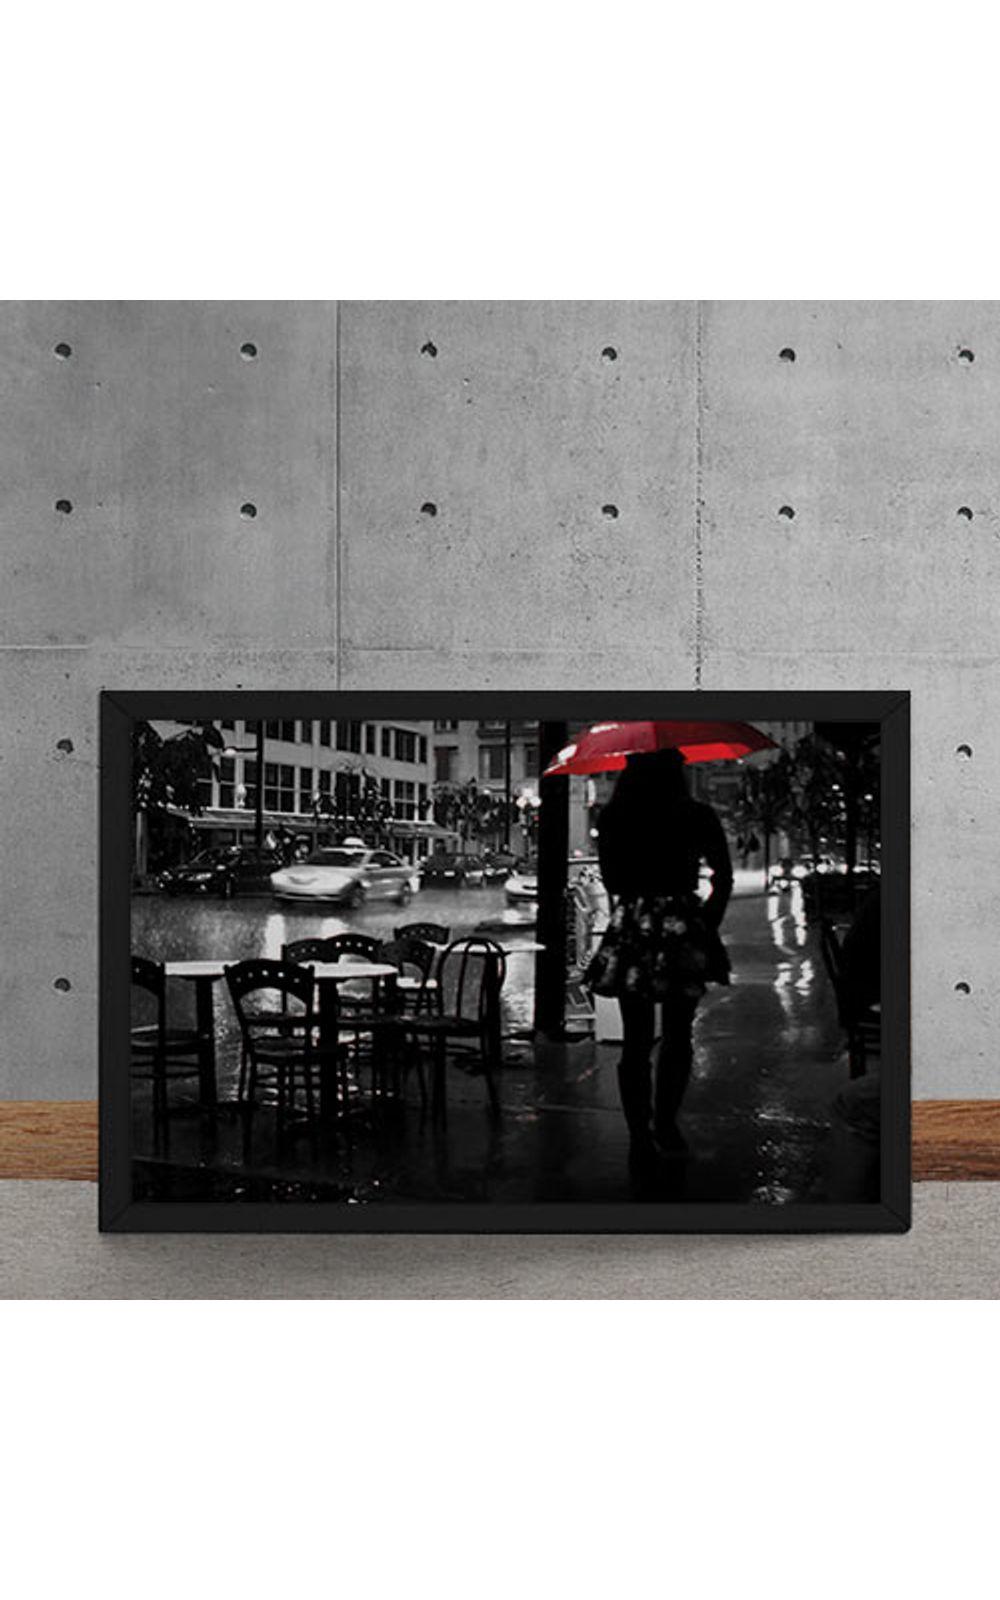 Foto 5 - Quadro Decorativo Noite Chuvosa Guarda Chuva Vermelho